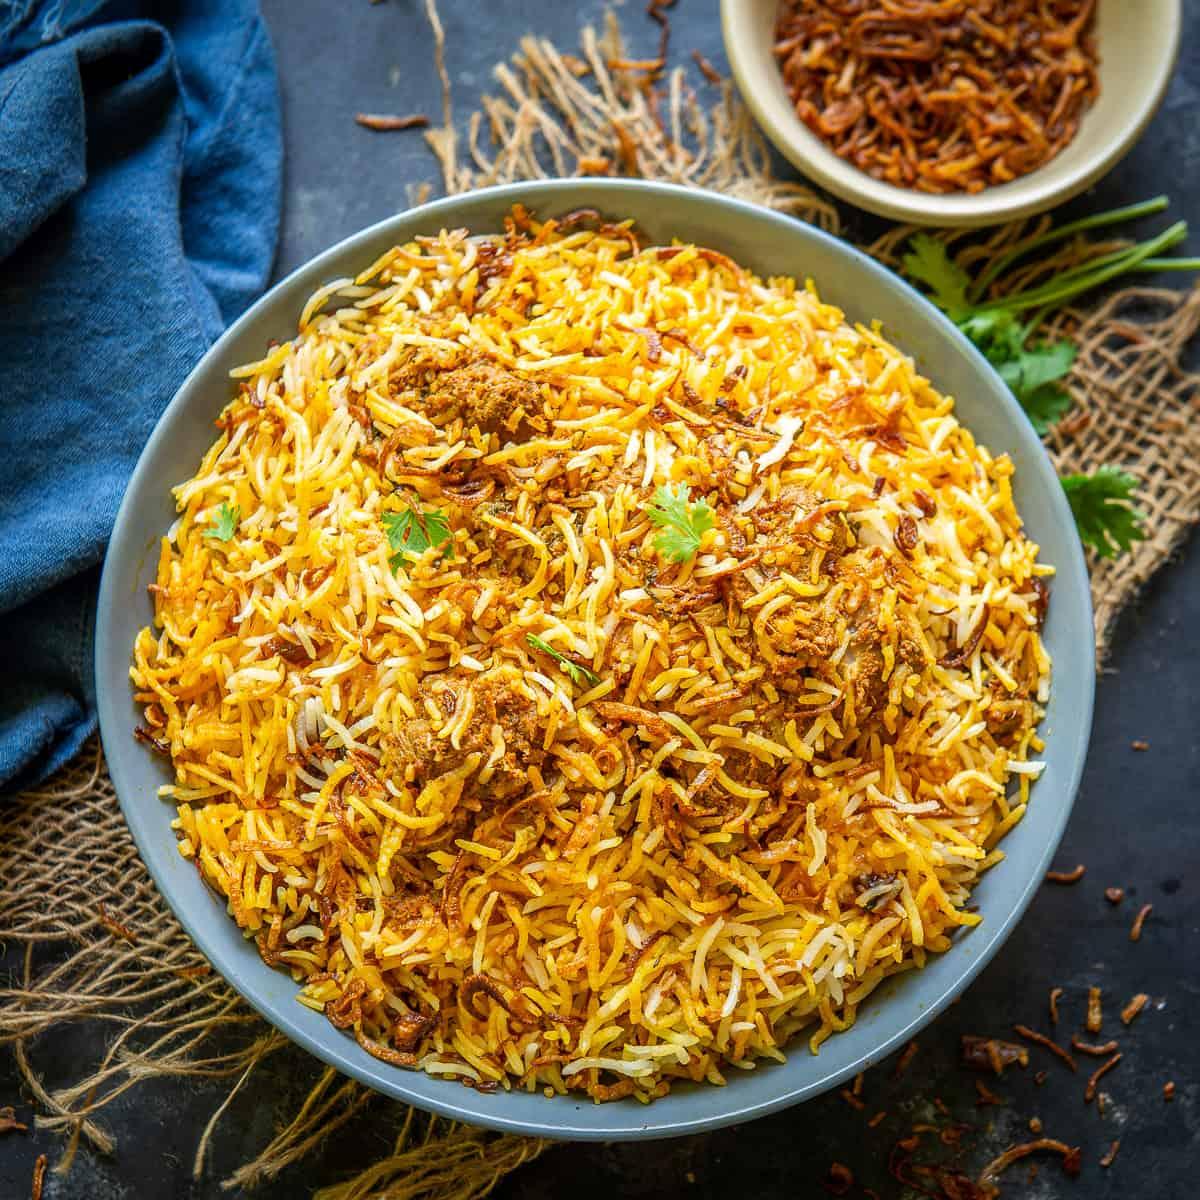 Mutton Biryani Recipe (Step by Step + Video) - Whiskaffair